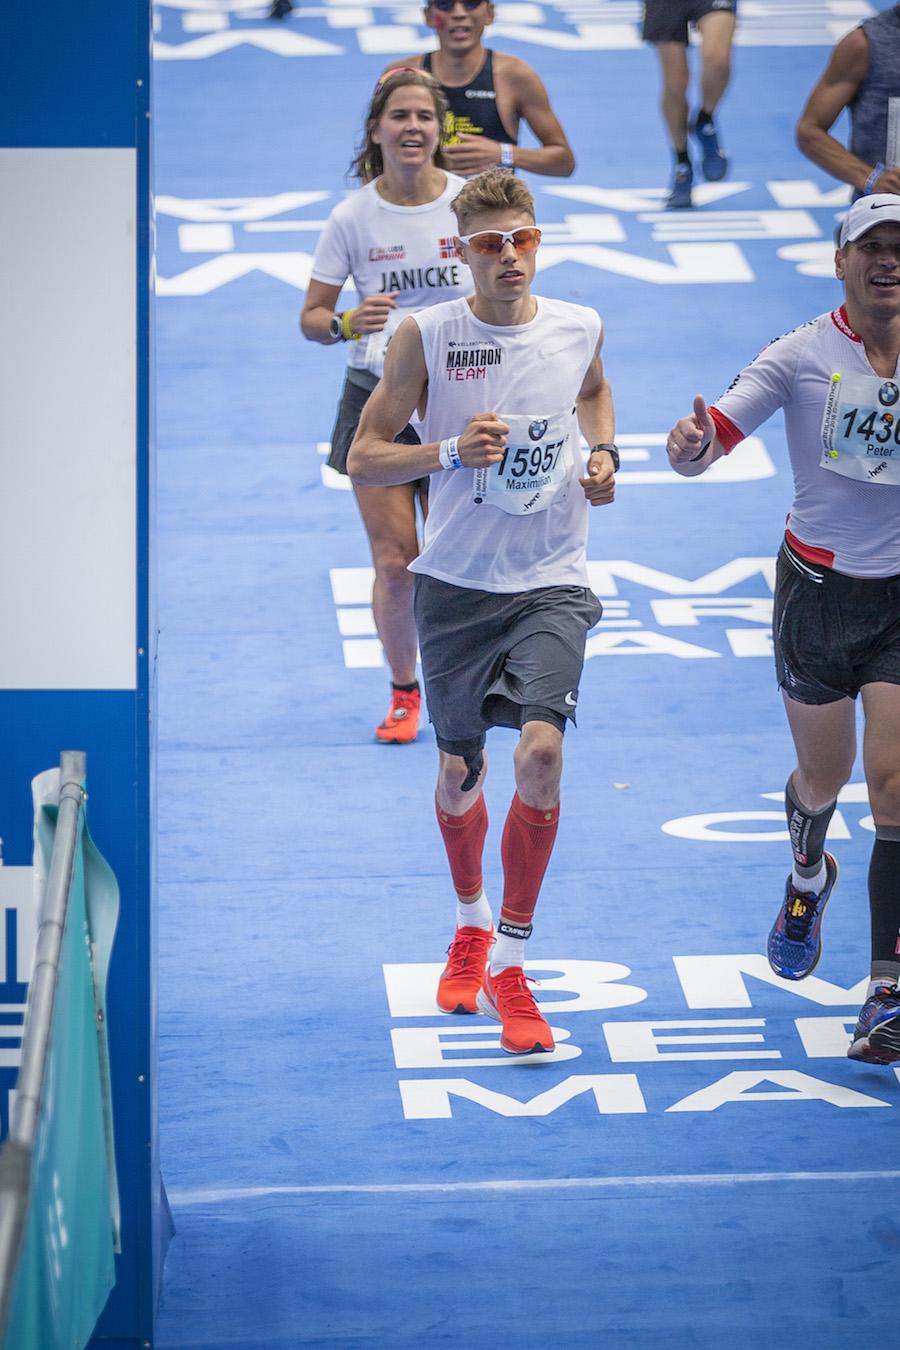 Keller Sports Nike Marathon Team_14